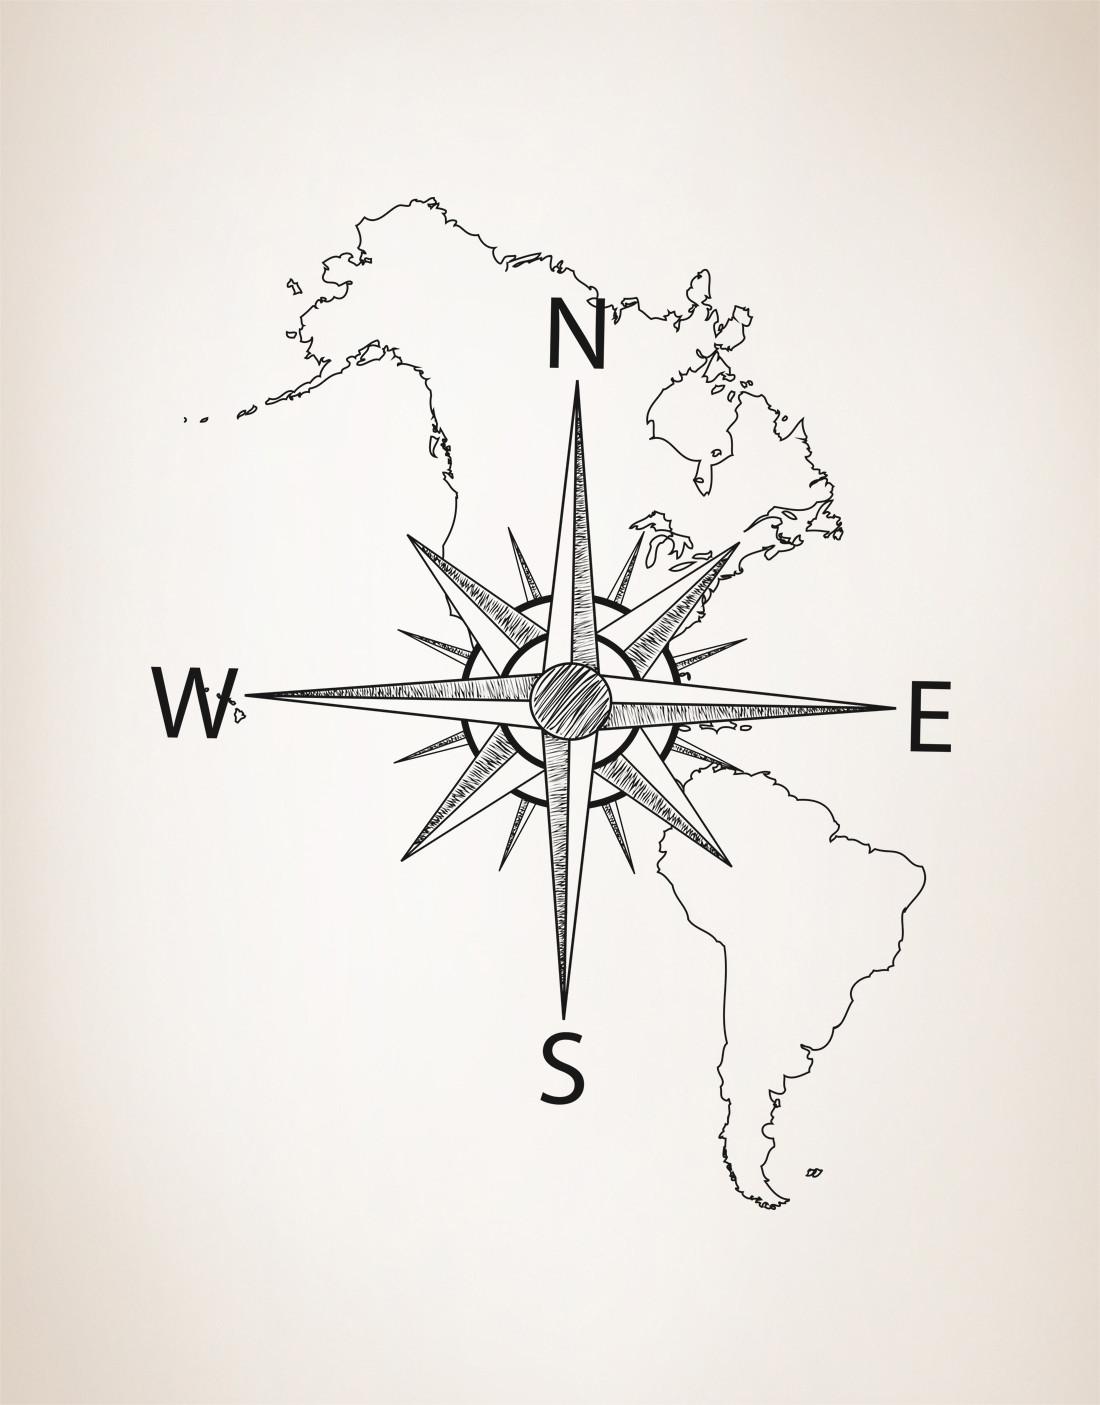 North America Drawing At Getdrawings